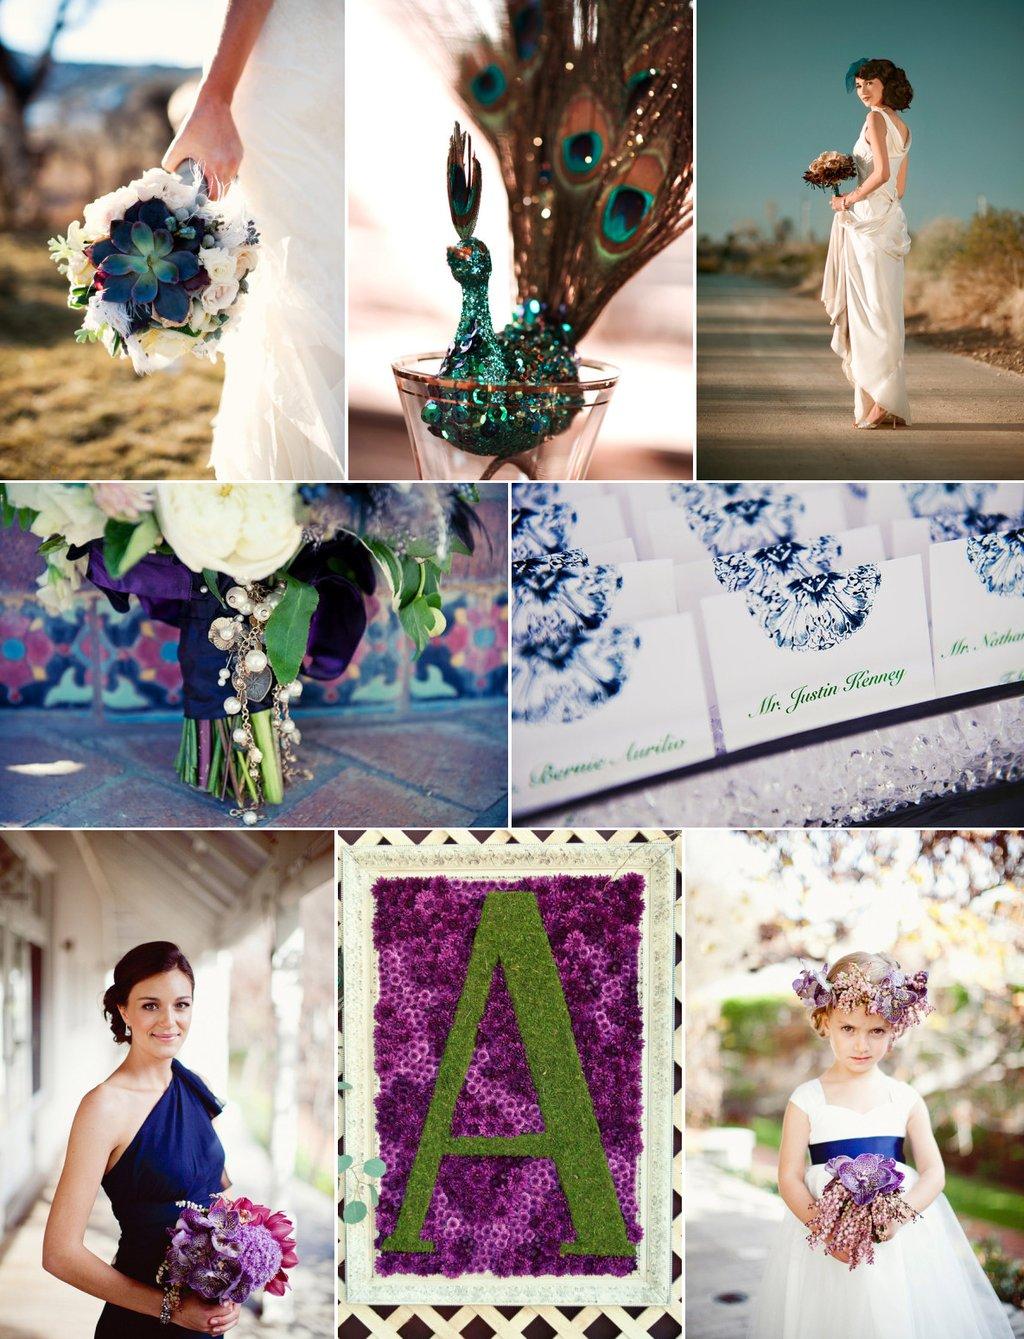 Elegant-jewel-tones-wedding-color-palette-navy-blue-purple-green.full